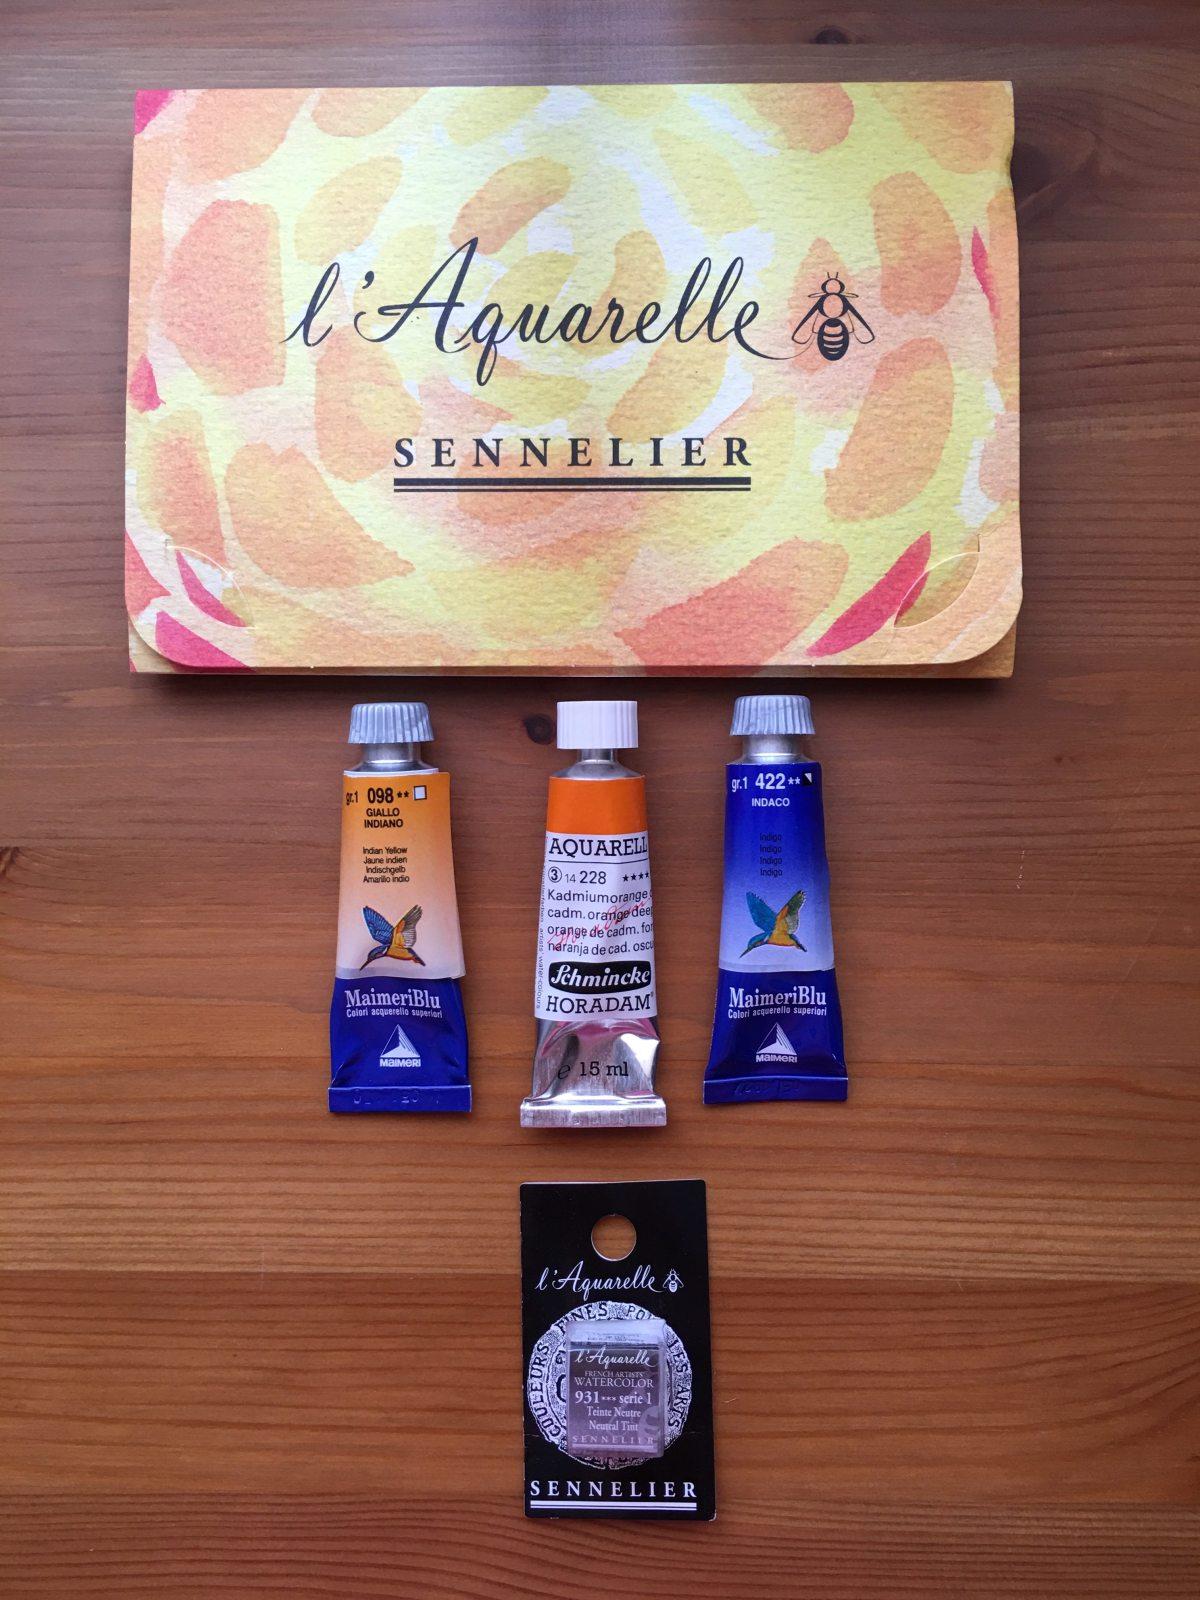 Schmincke, Sennelier, MaimeriBlu watercolour tube, pans and samples